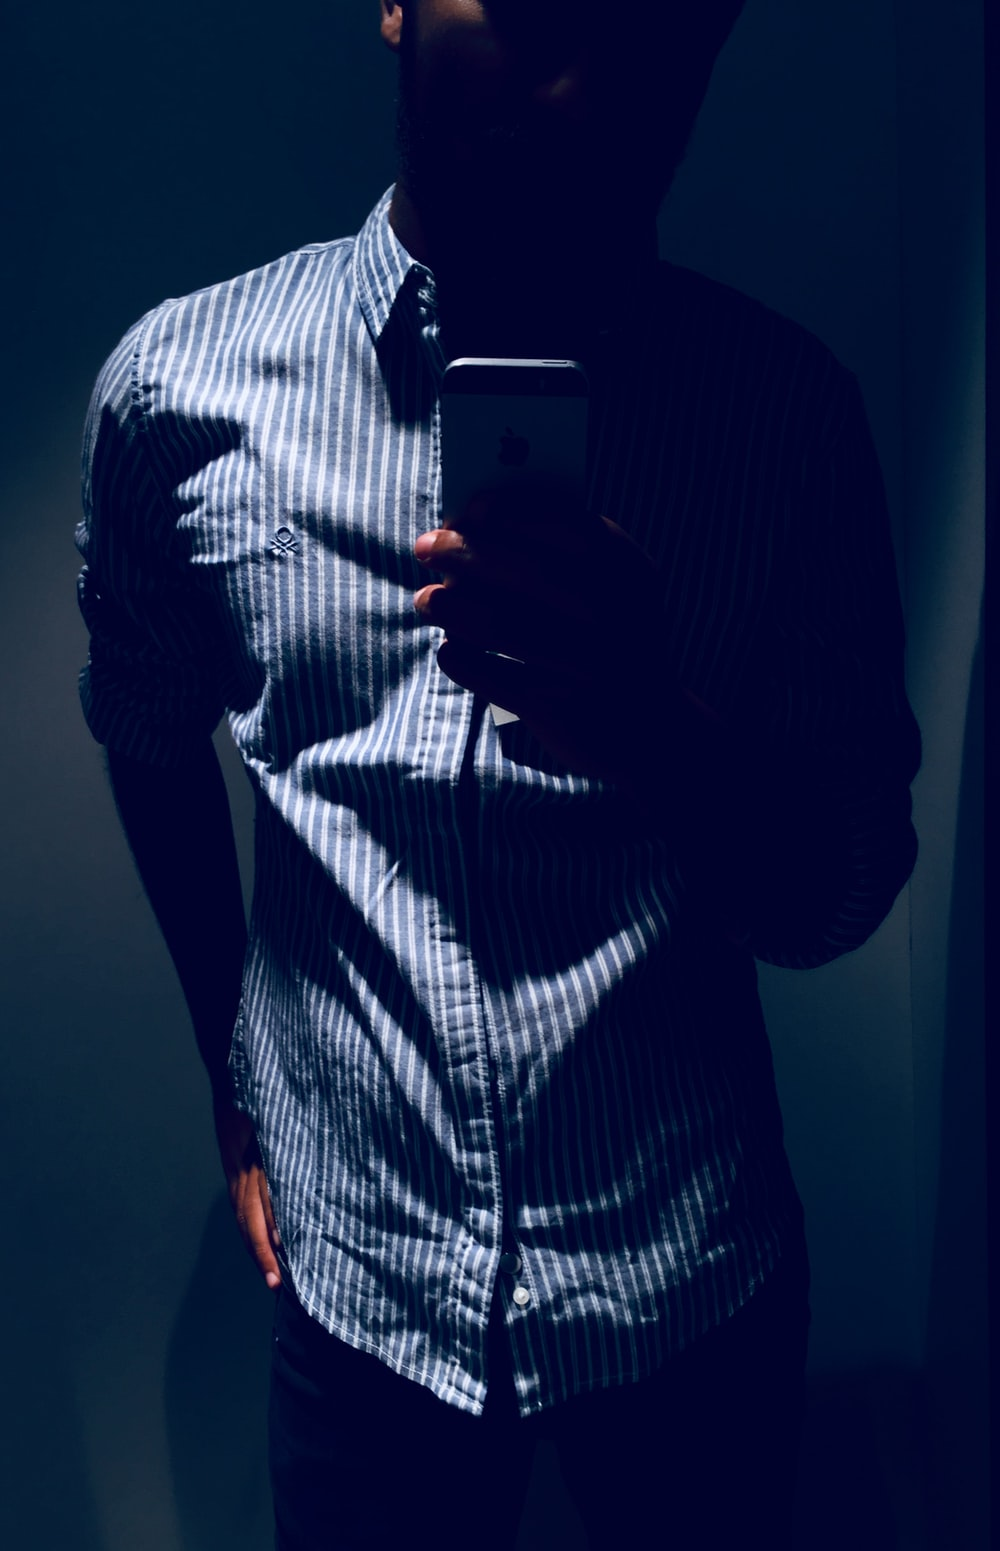 man wearing white and gray striped dress shirt